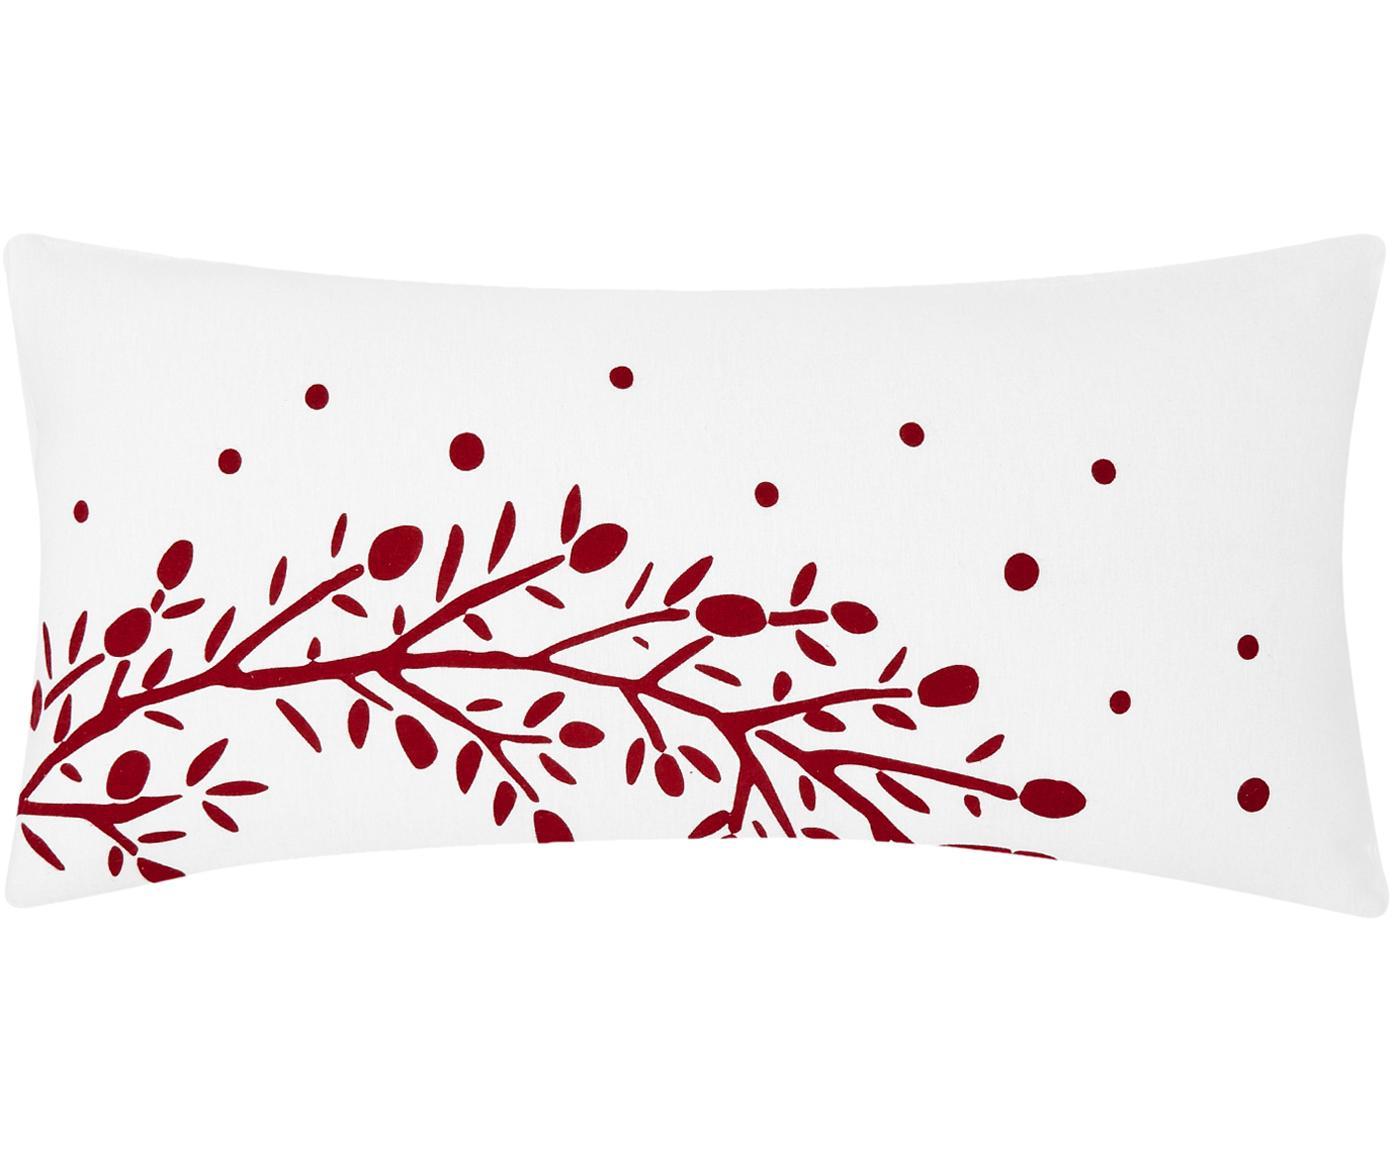 Flanell-Kissenbezüge Mistletoe, 2 Stück, Webart: Flanell Flanell ist ein s, Weiß, Rot, 40 x 80 cm